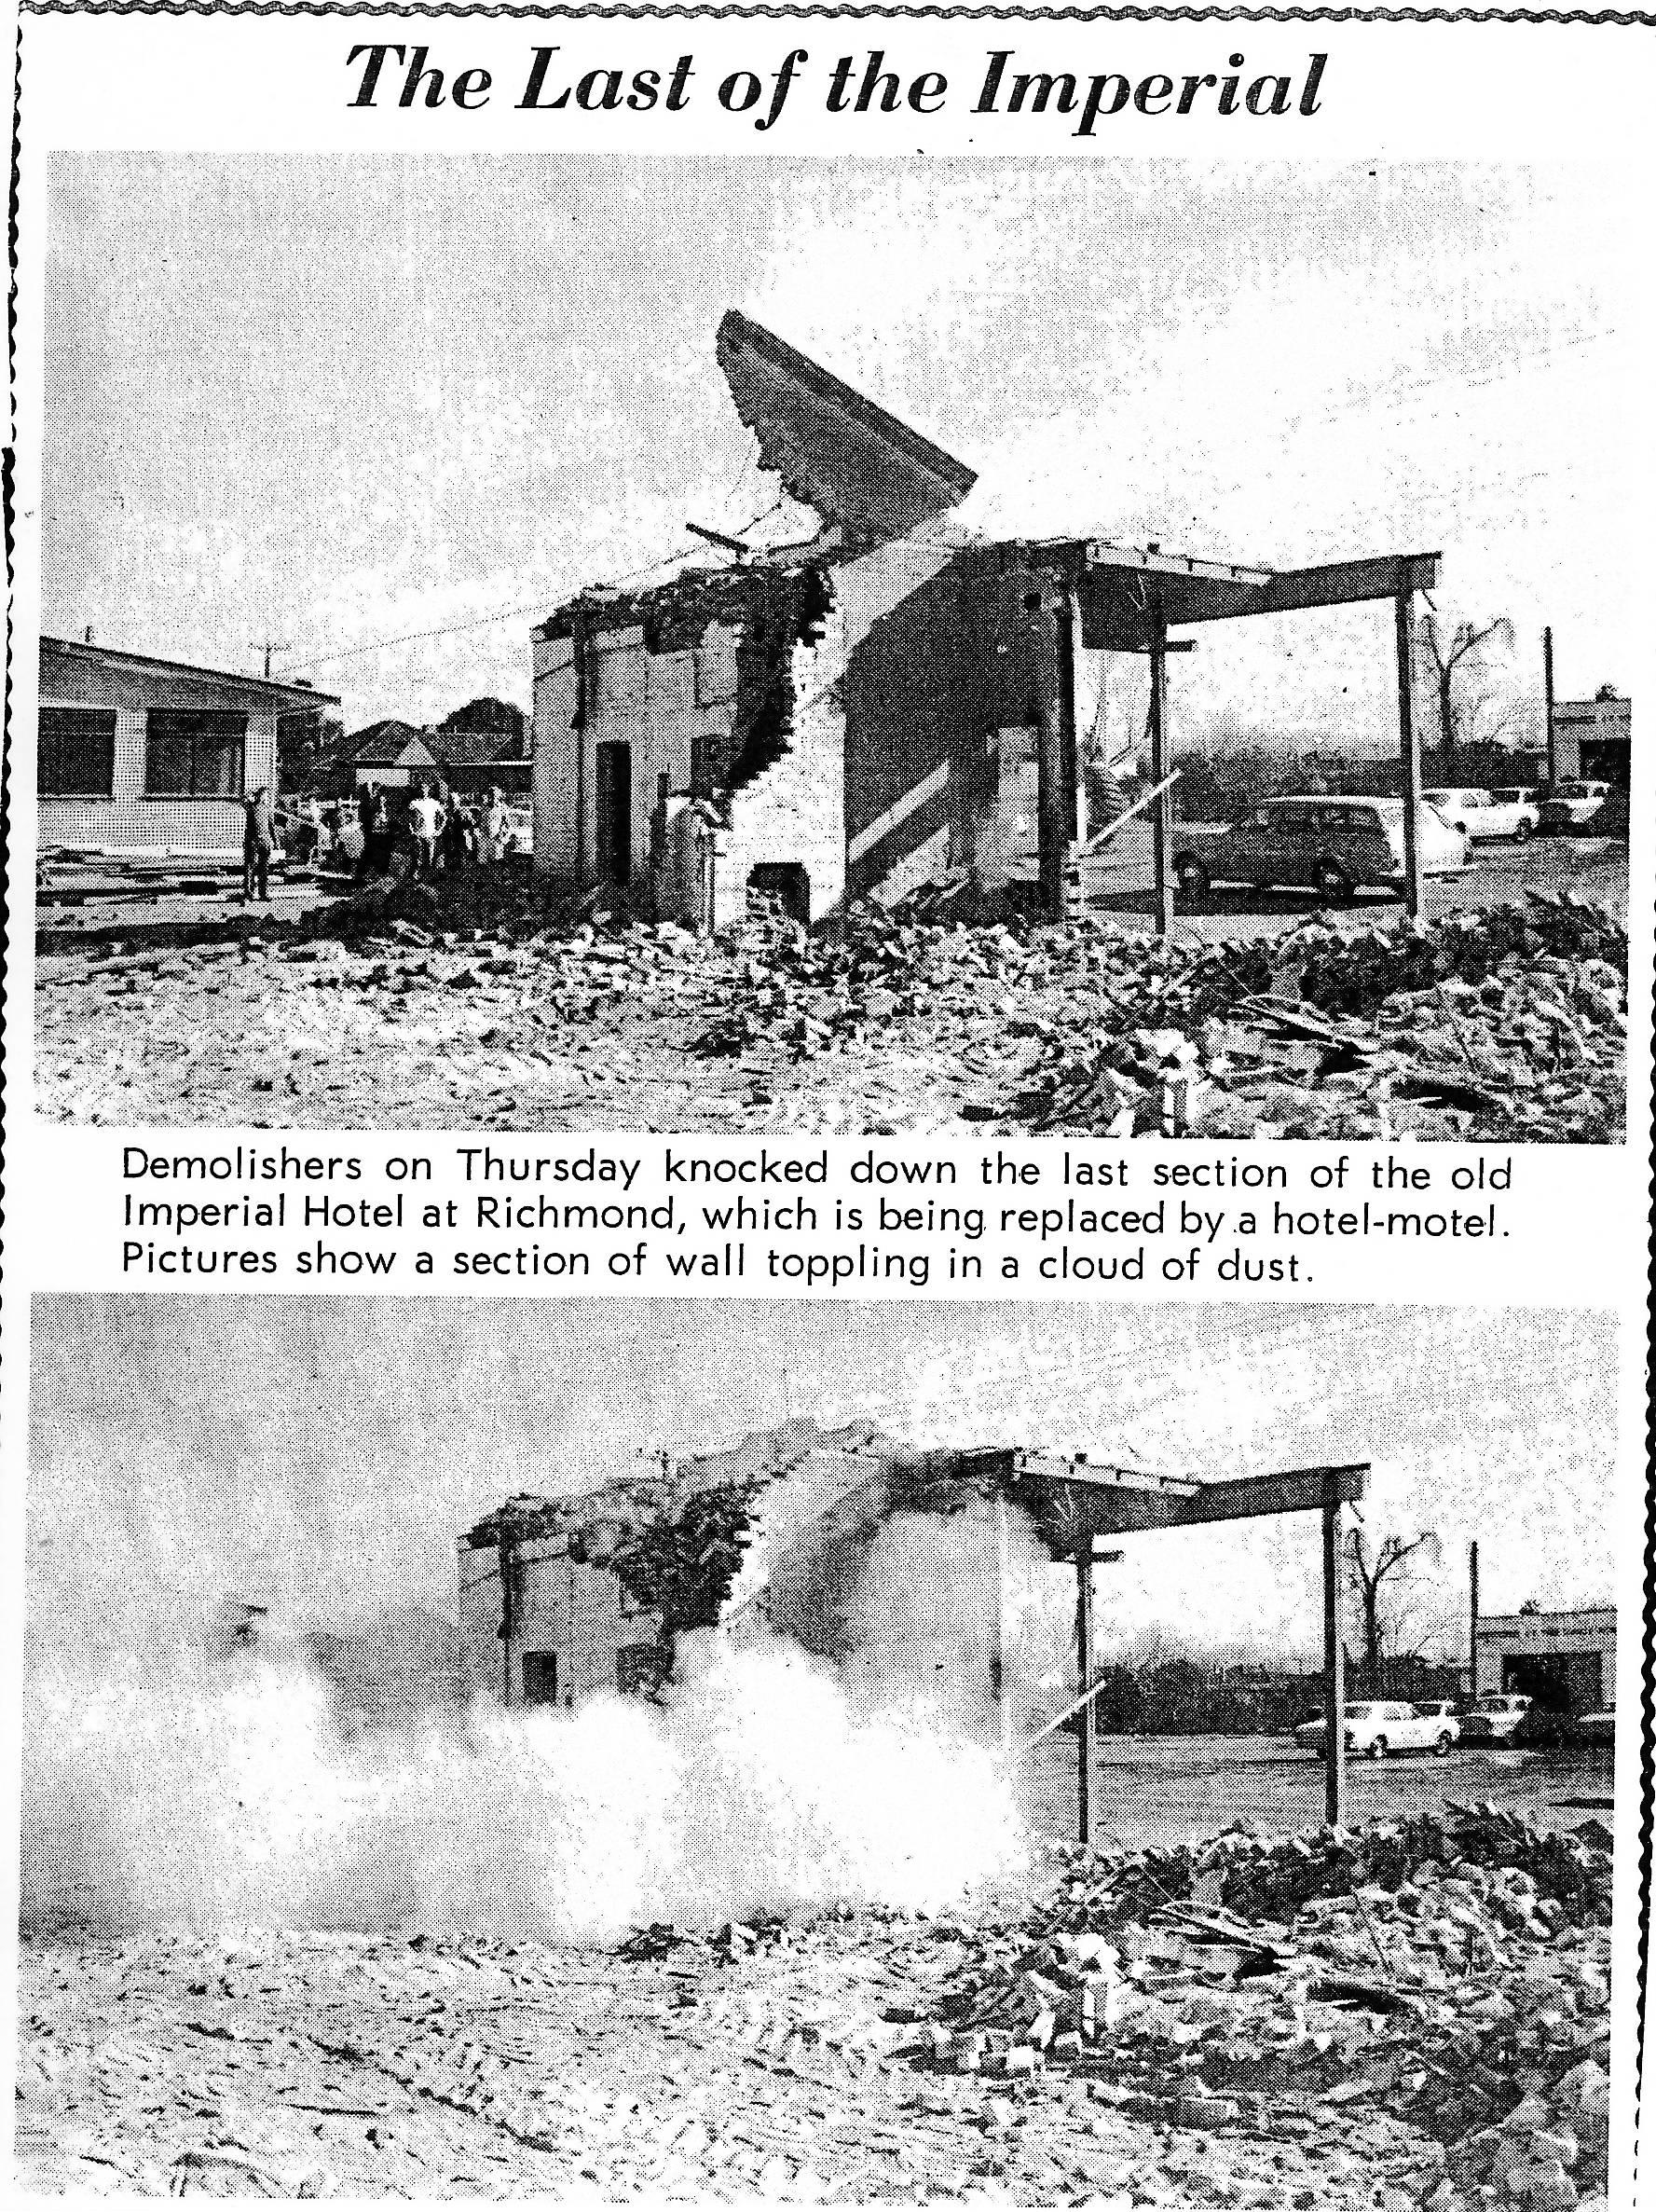 Demolishing the Imperial Hotel Richmond NSW